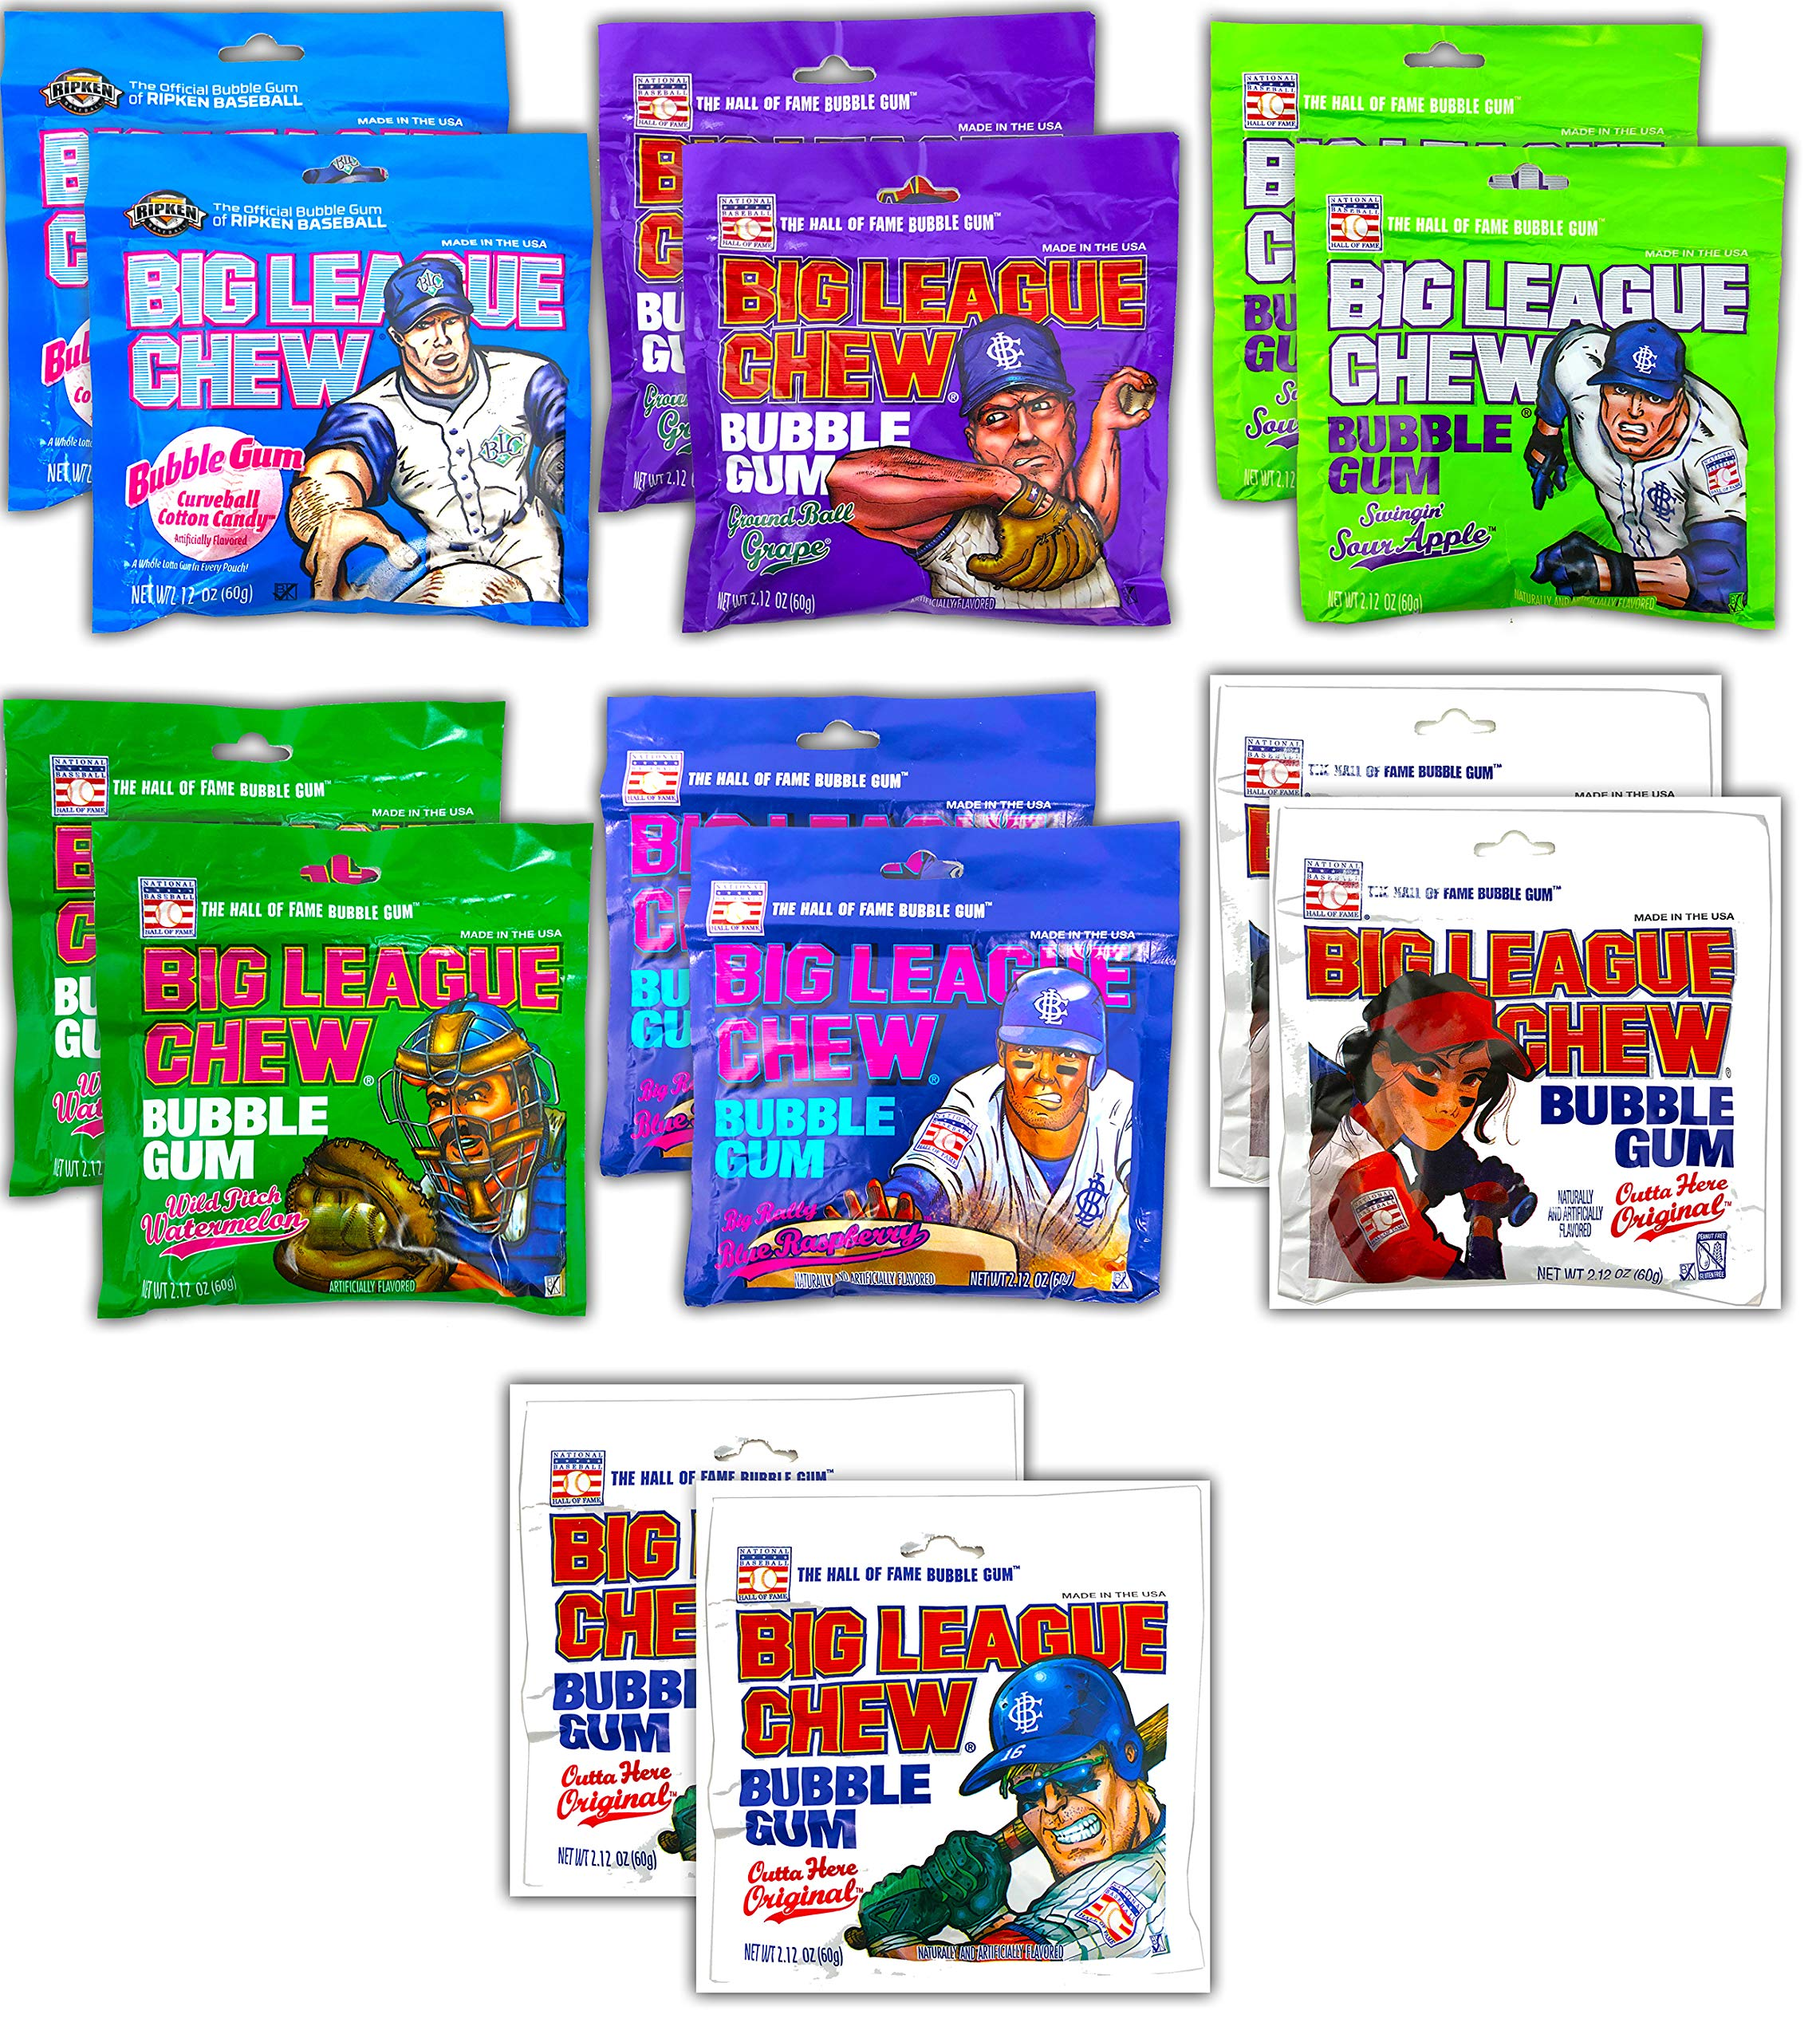 Big League Chew Bubble Gum Variety Pack 7 Flavors - Gum Packs for Softball Teams, Little League Teams, Baseball Teams and Baseball Fans (14 Pack) by Tru Inertia